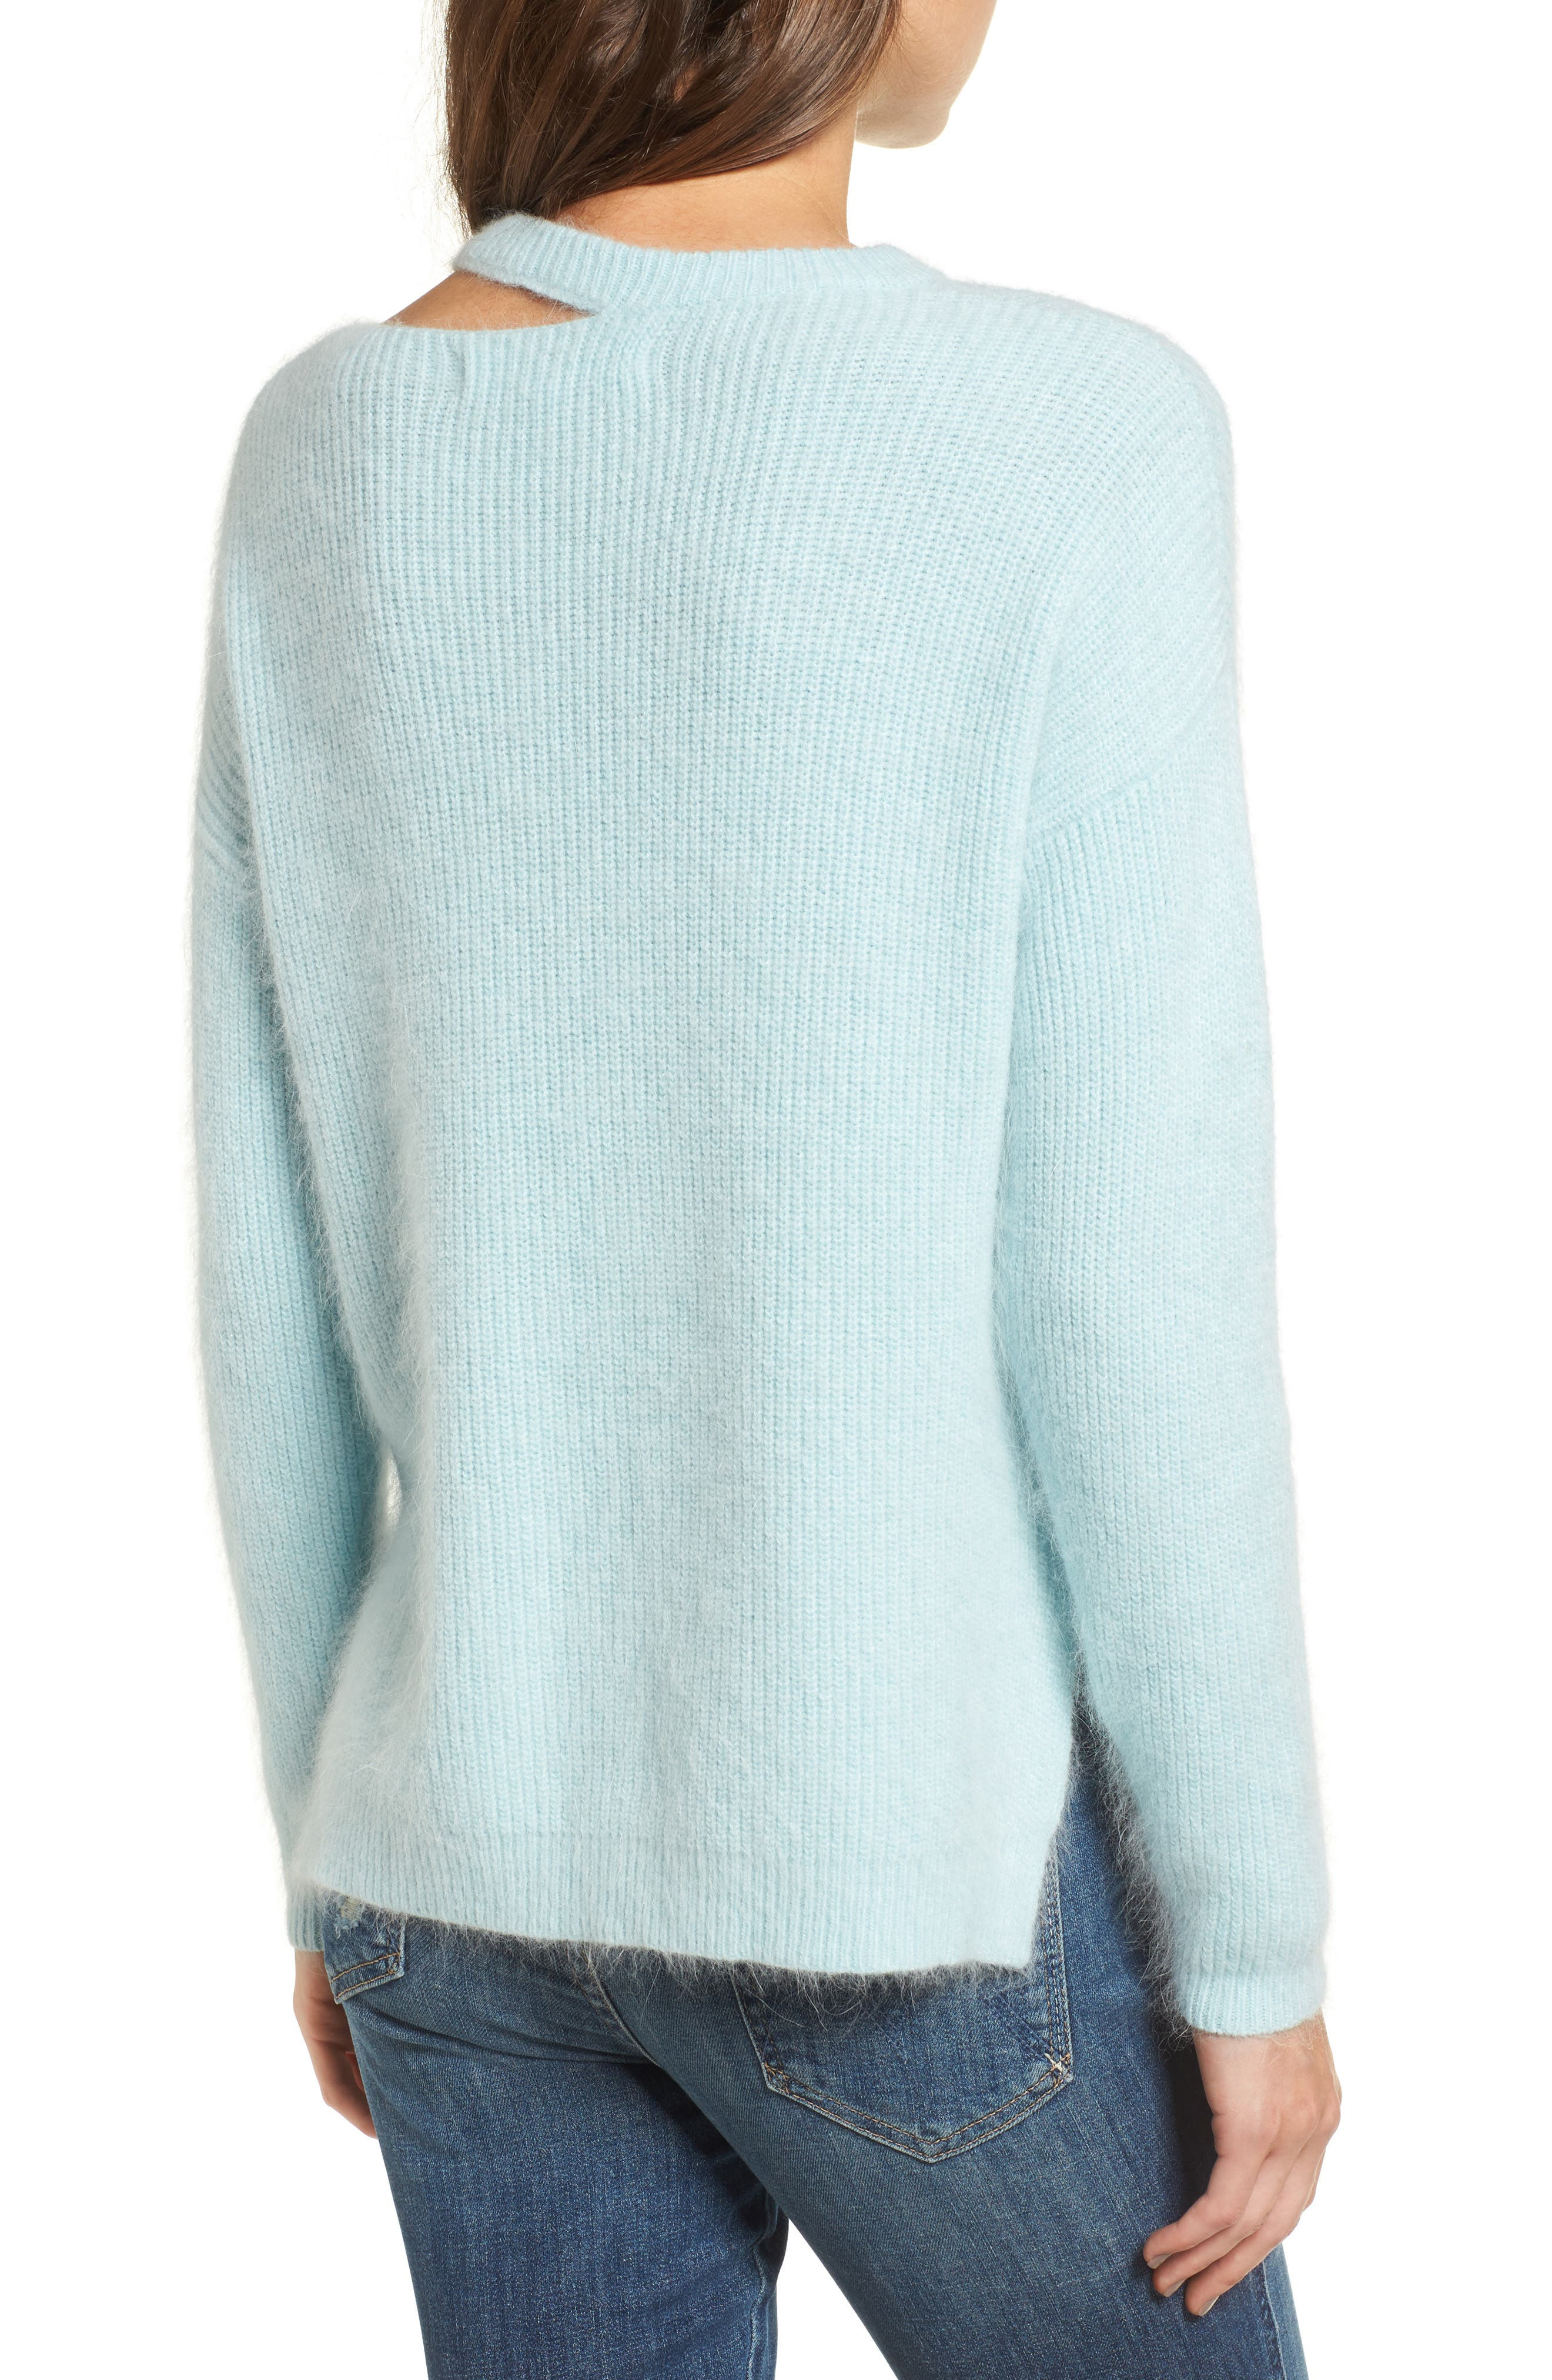 Ovidian Sweater,                             Alternate thumbnail 2, color,                             460